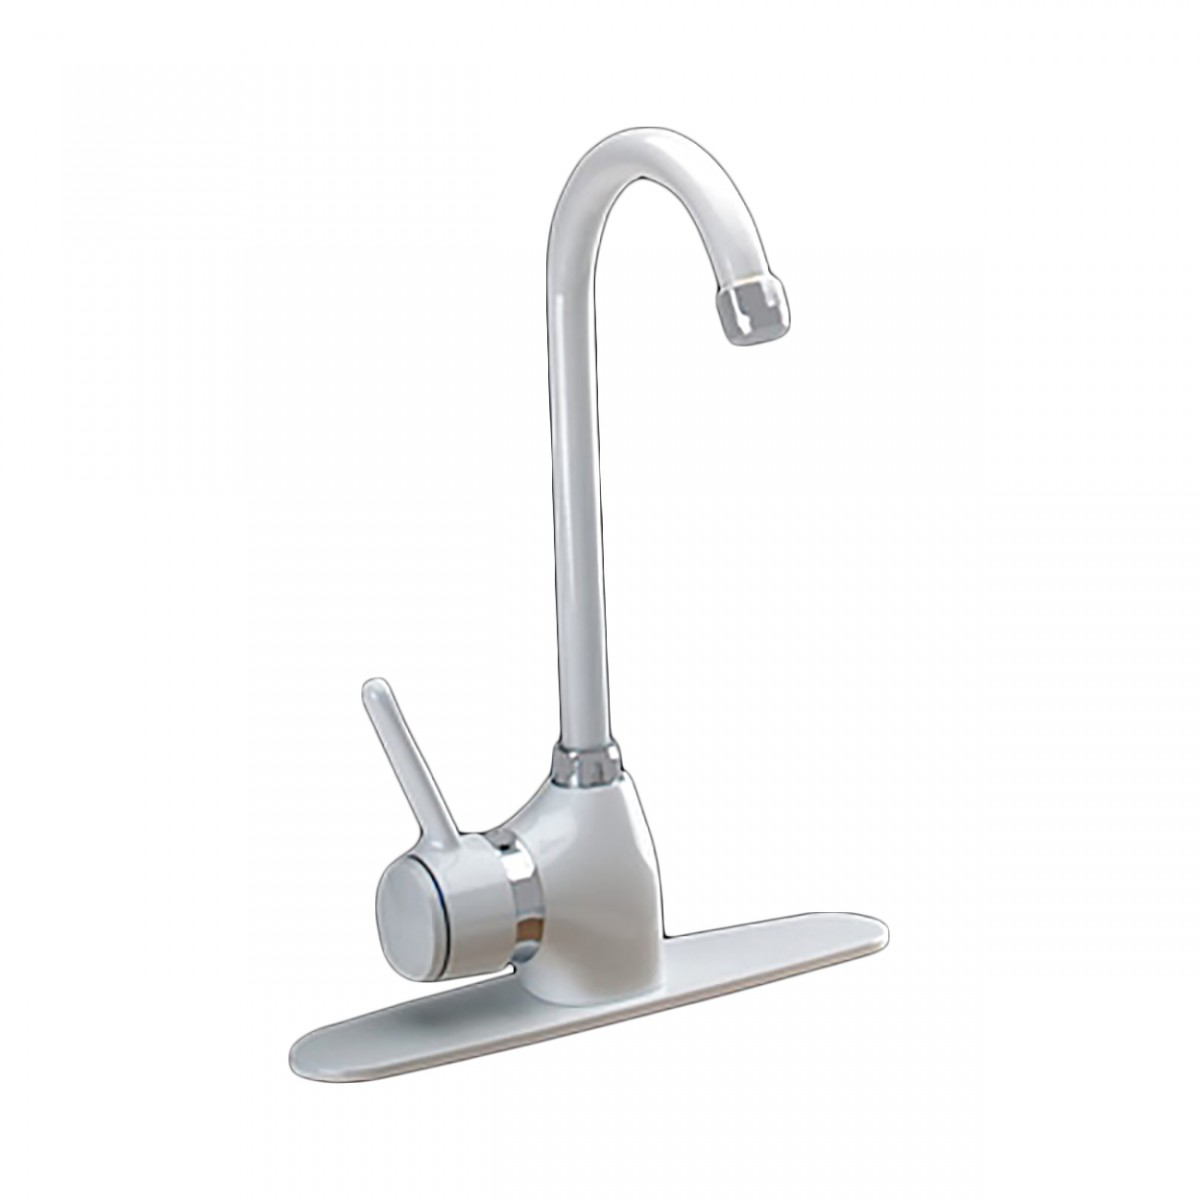 Faucet Gooseneck White Classic Single Hole 1 Handle